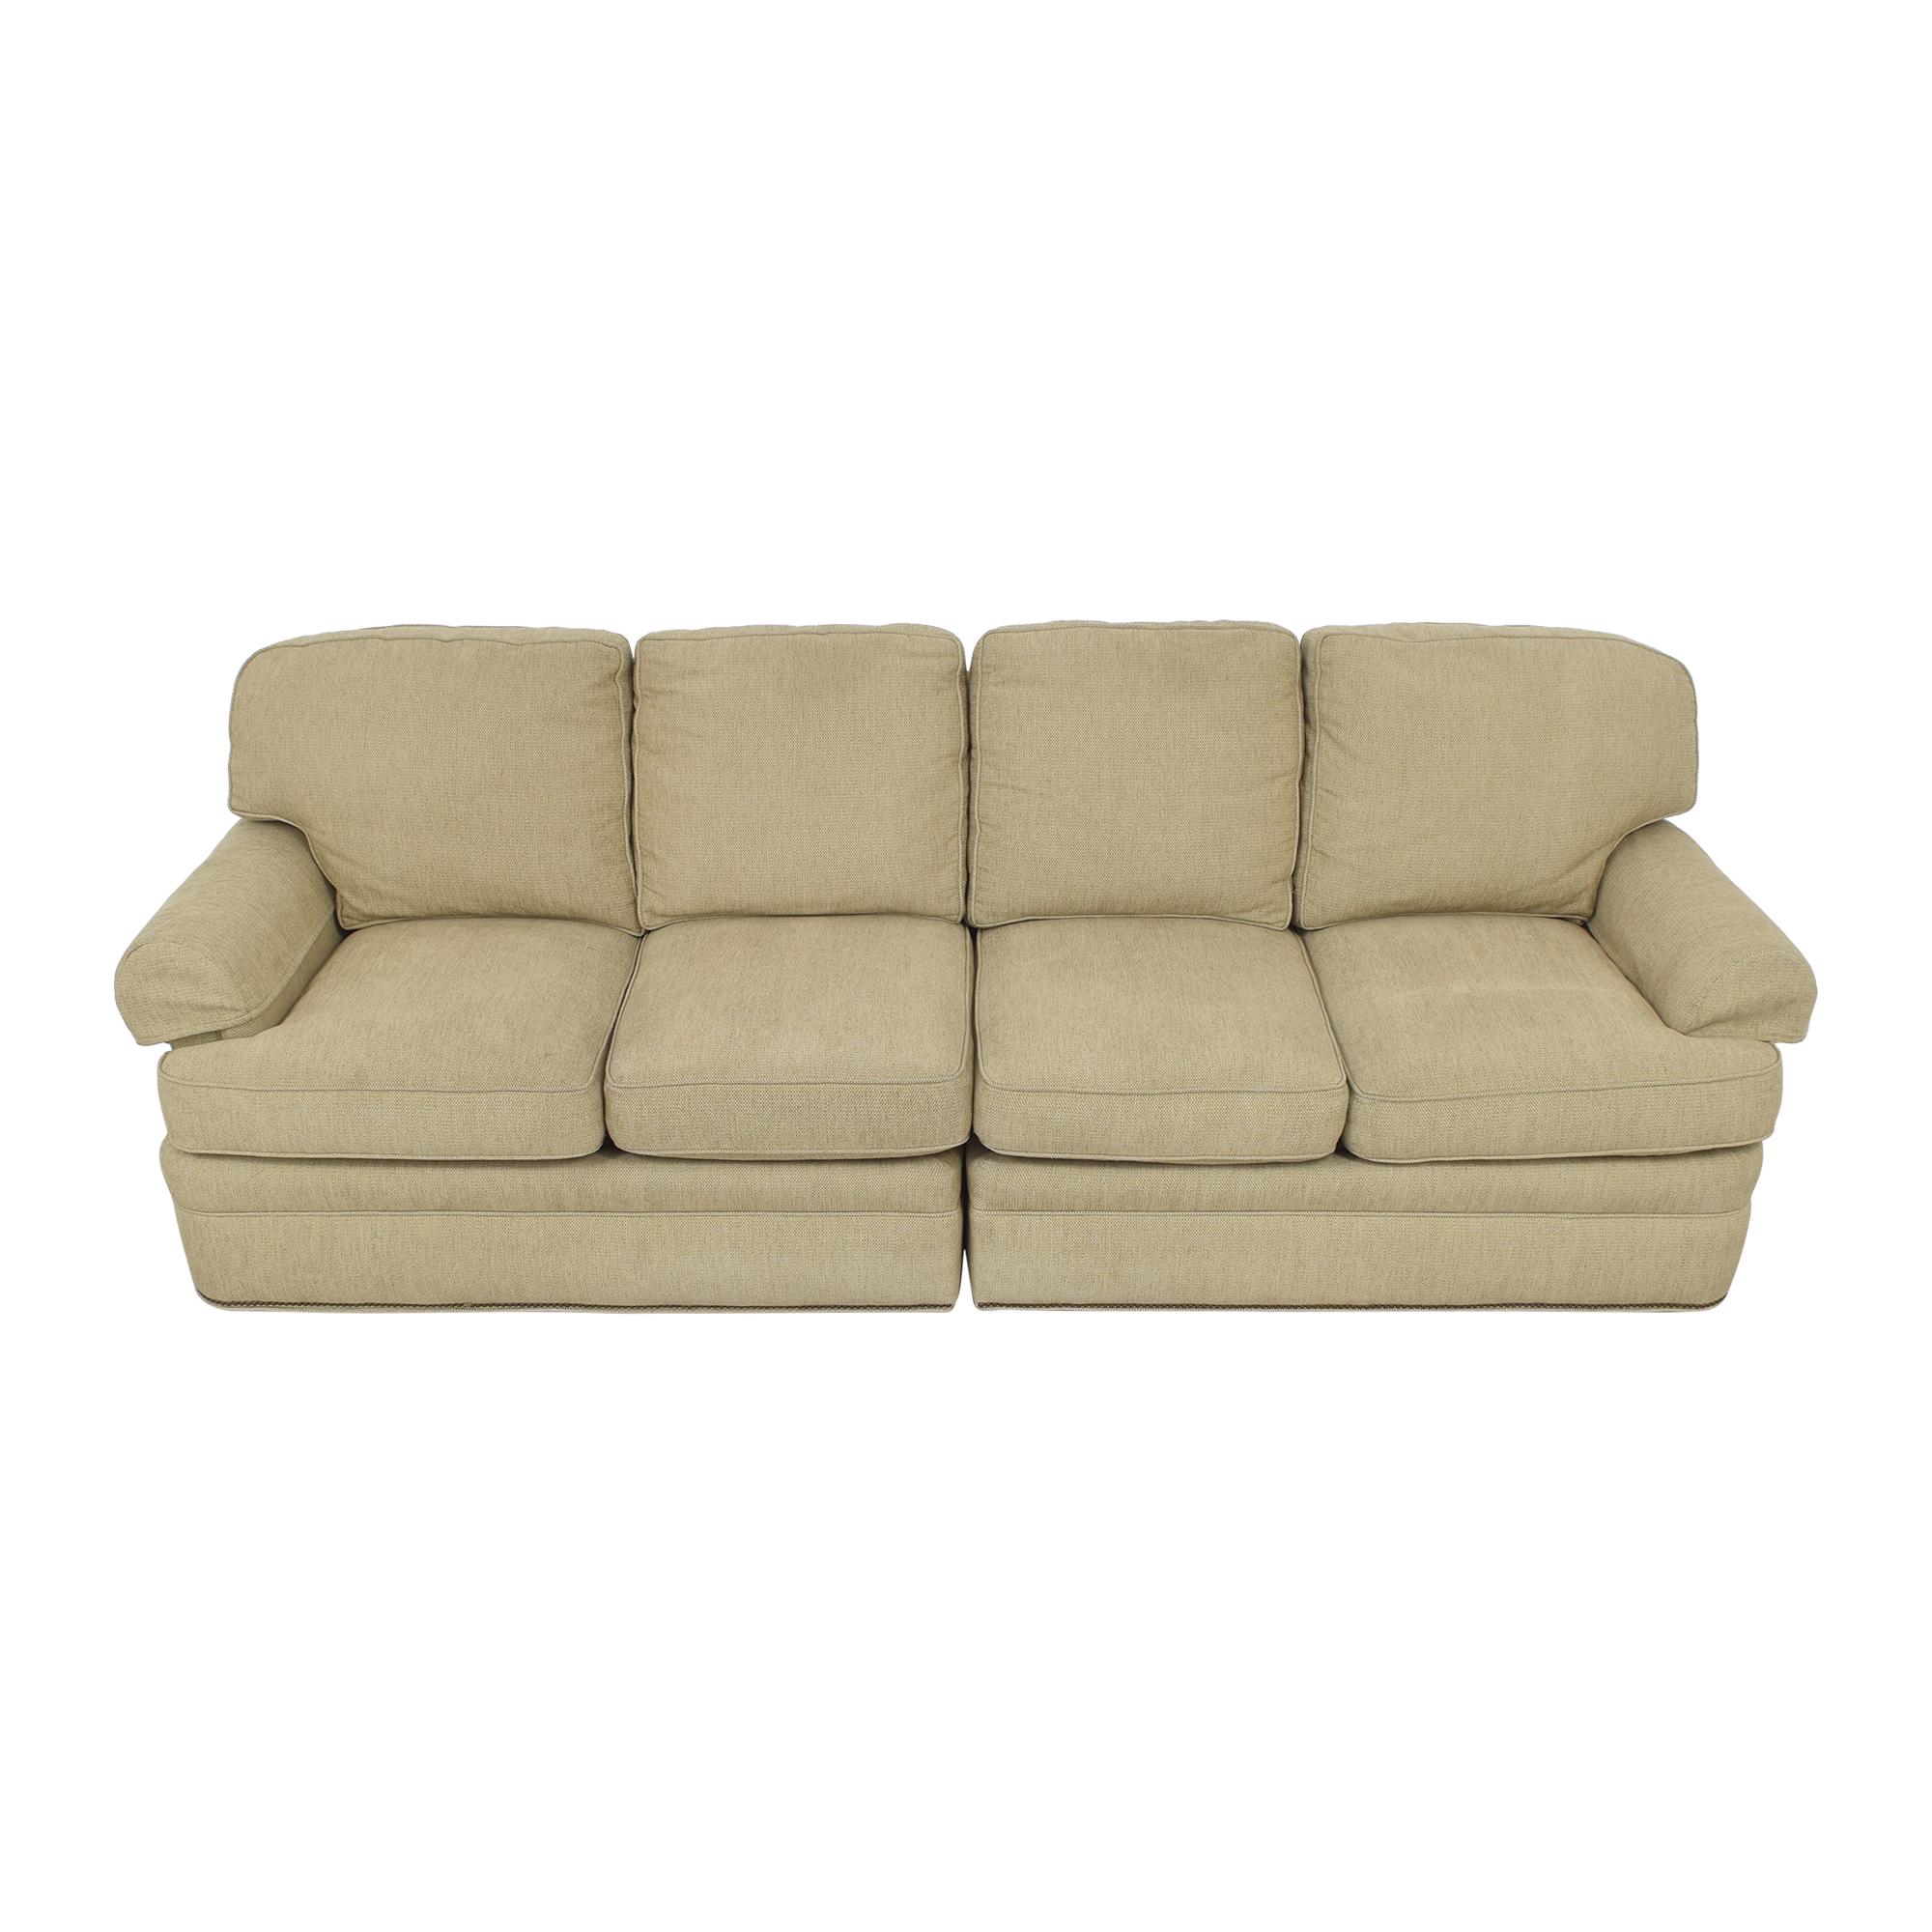 Safavieh Safavieh Two Piece Sectional Sofa ma